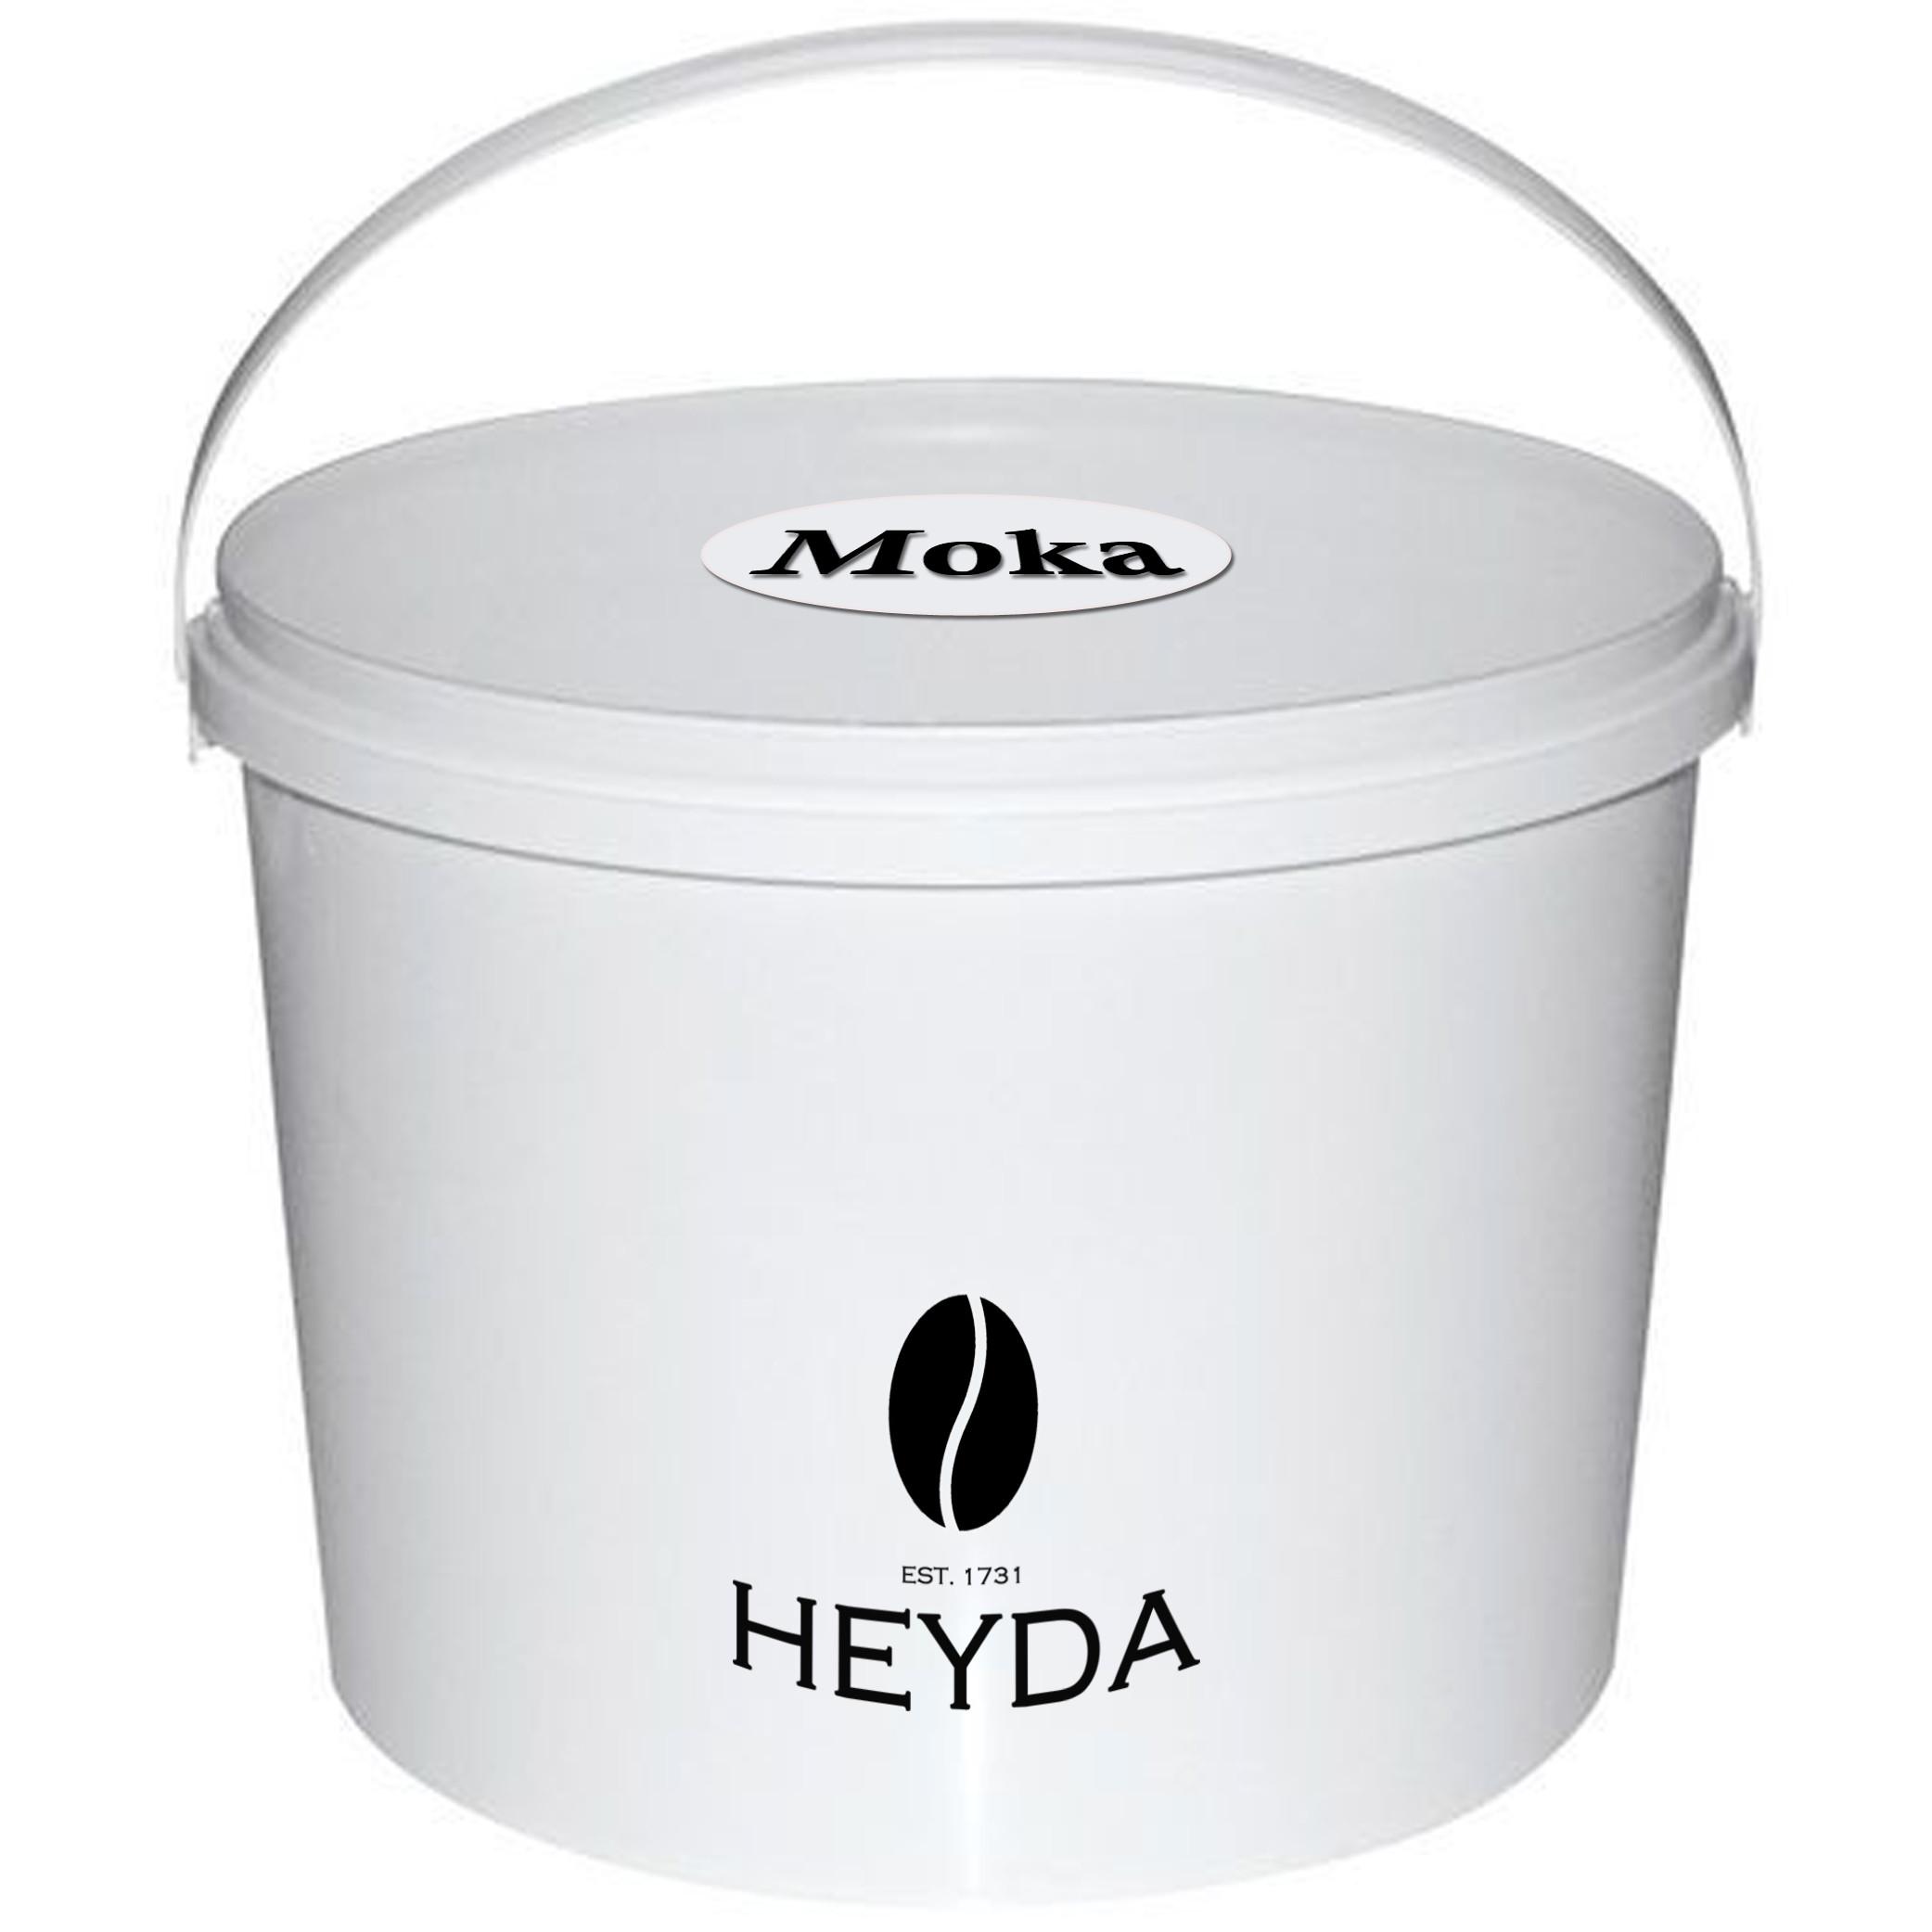 Café Heyda MOKA 8kg Grains (Koffie)